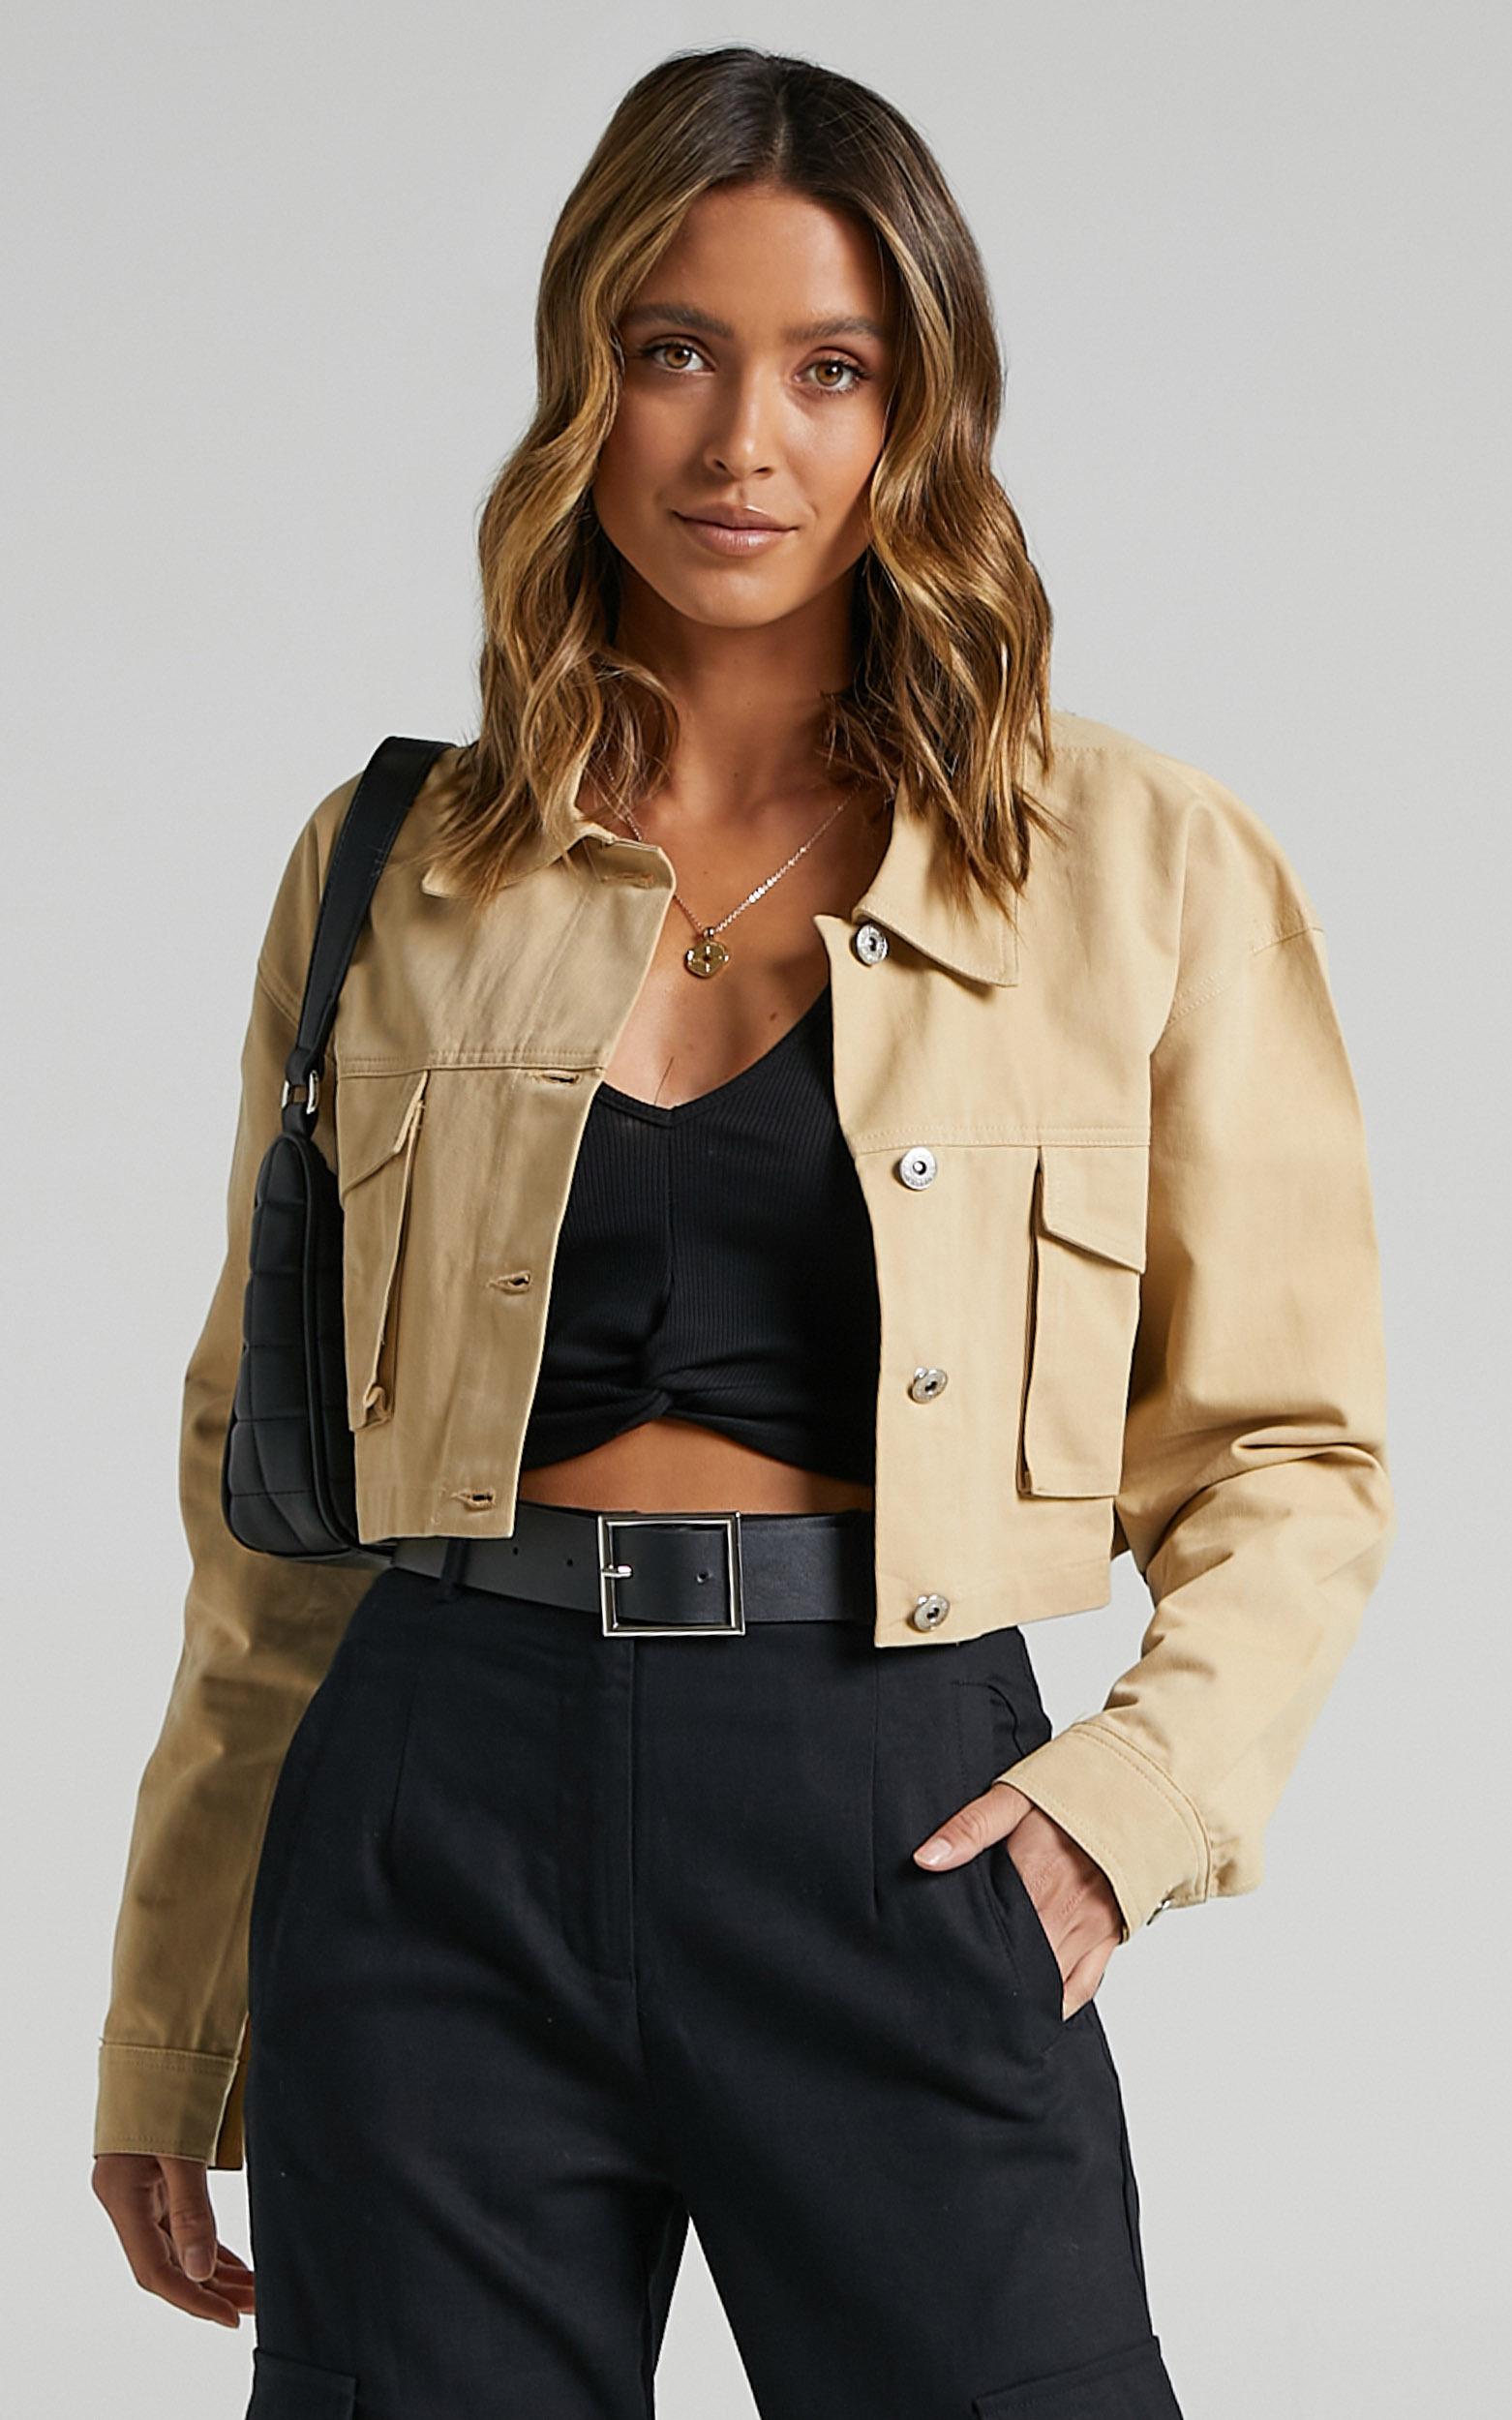 Kincade Jacket in Beige - 14 (XL), Beige, hi-res image number null